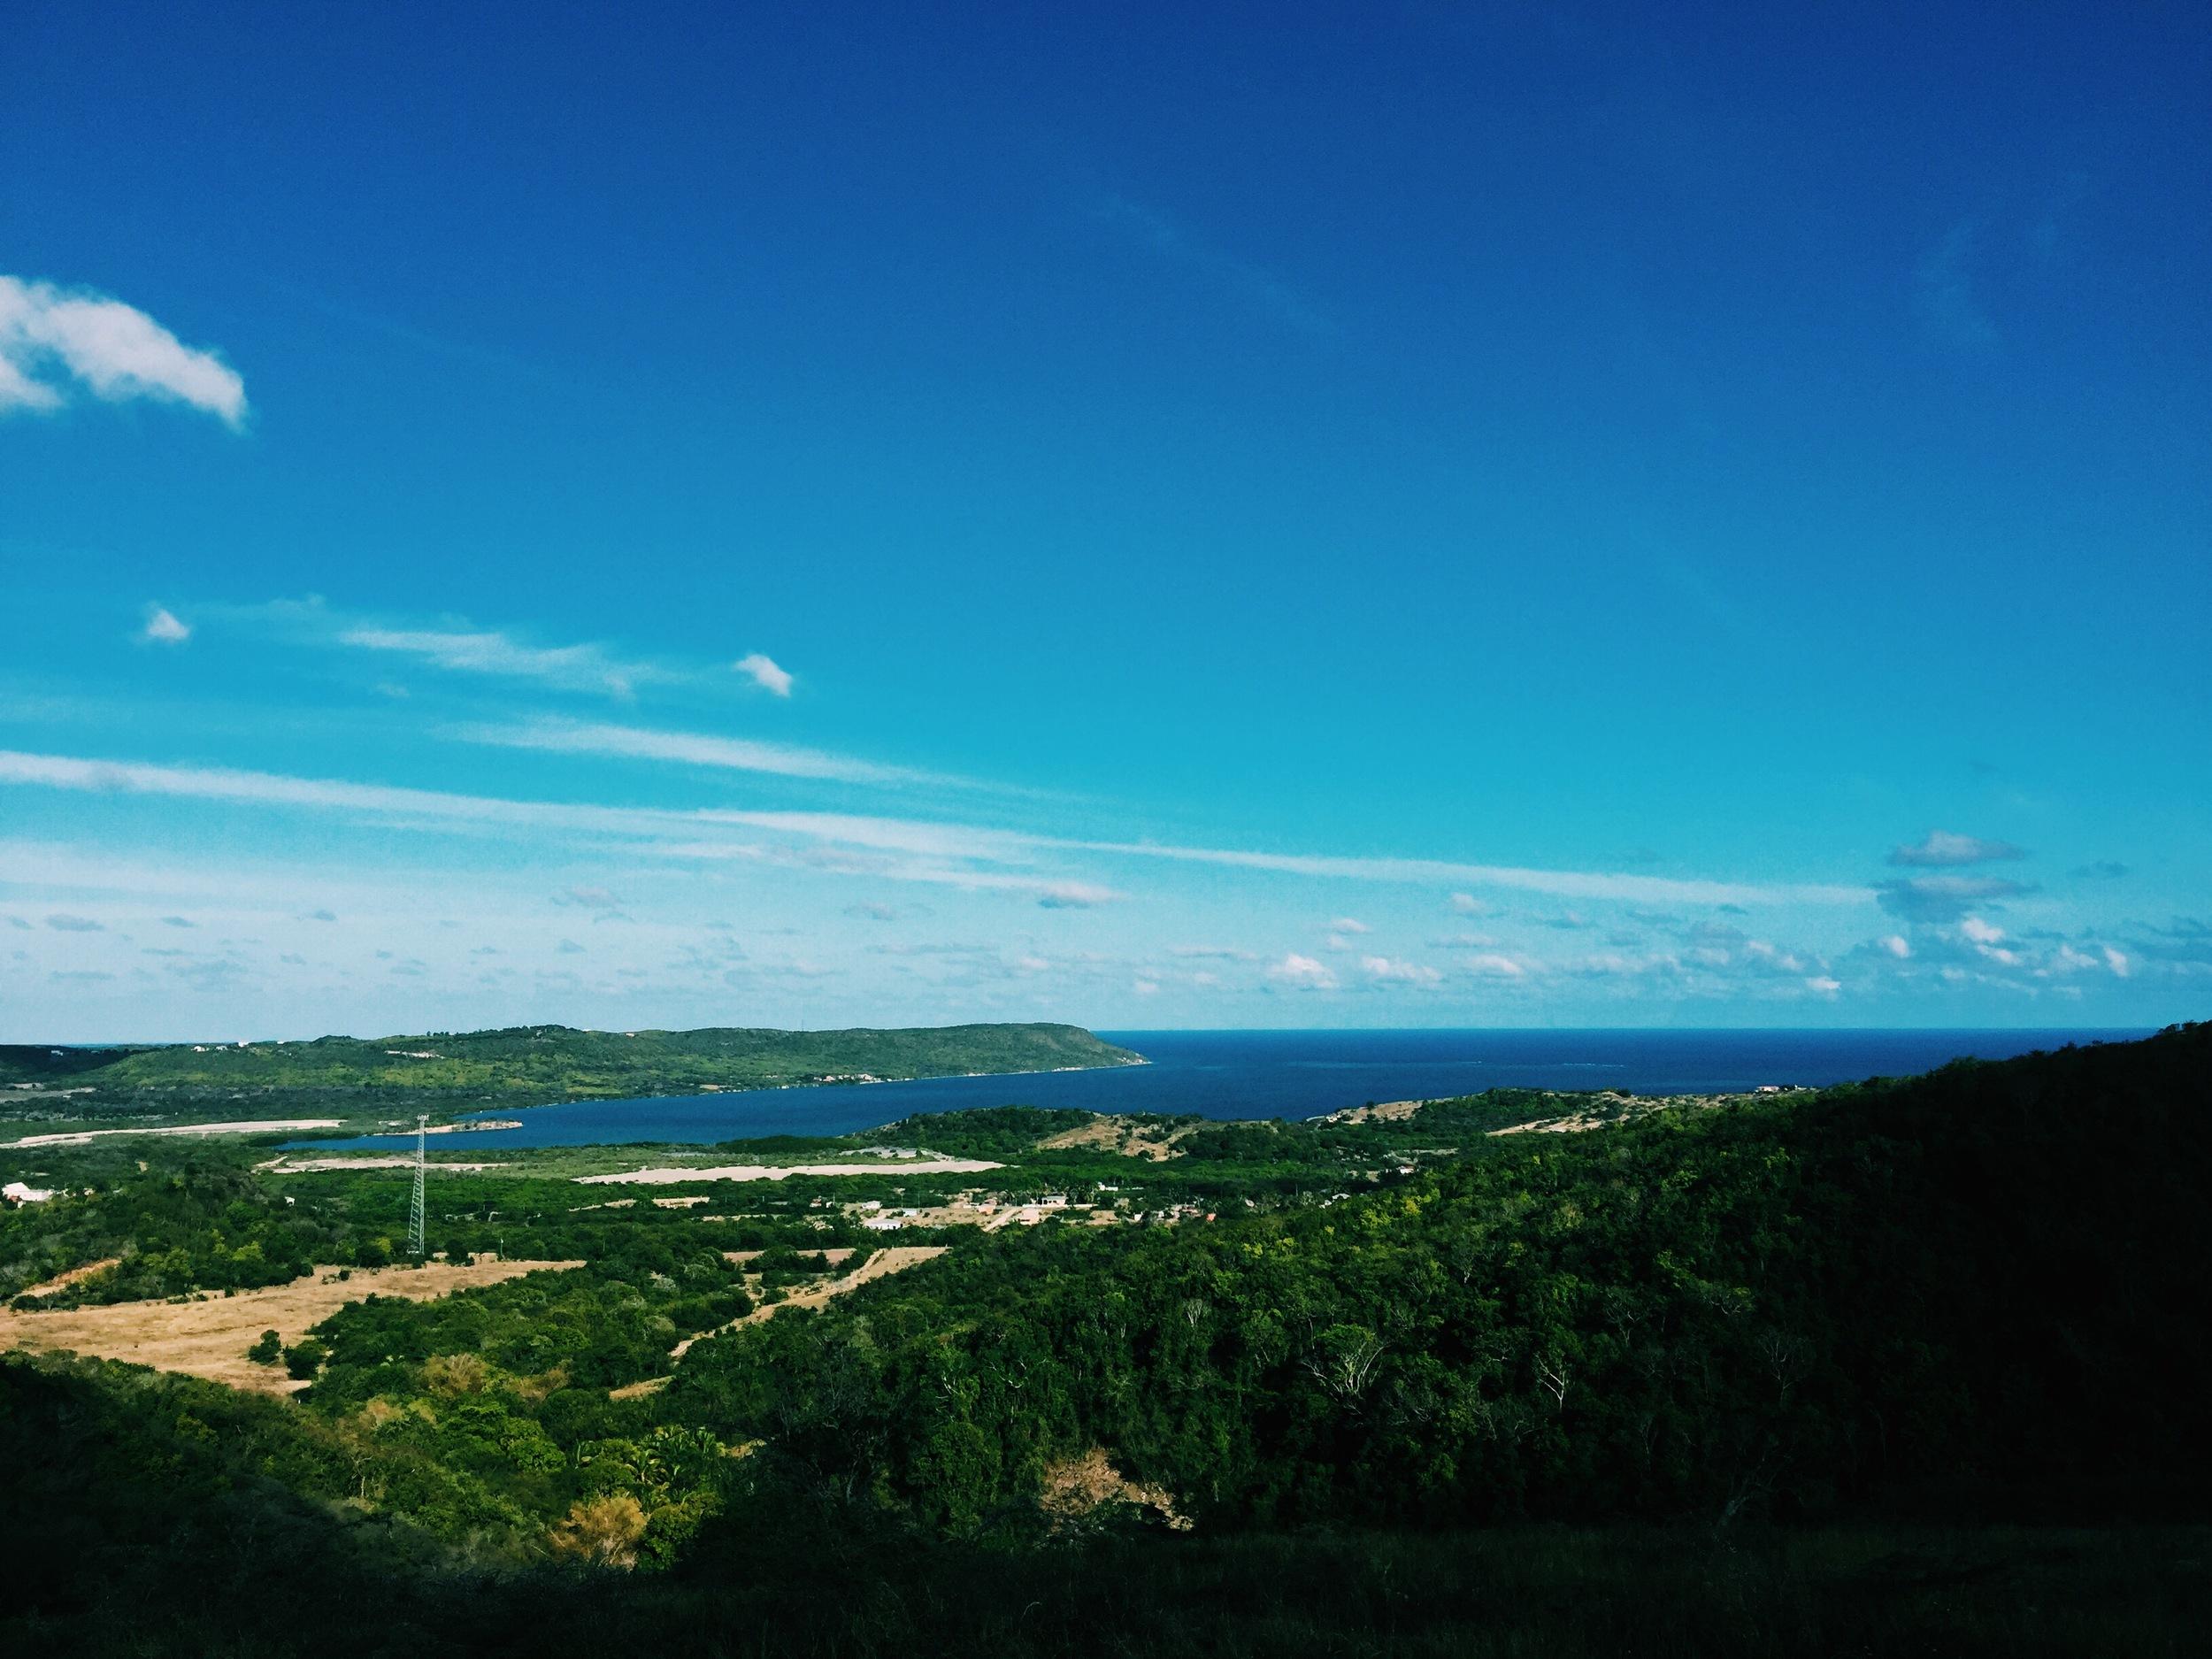 The view overlooking Bethesda